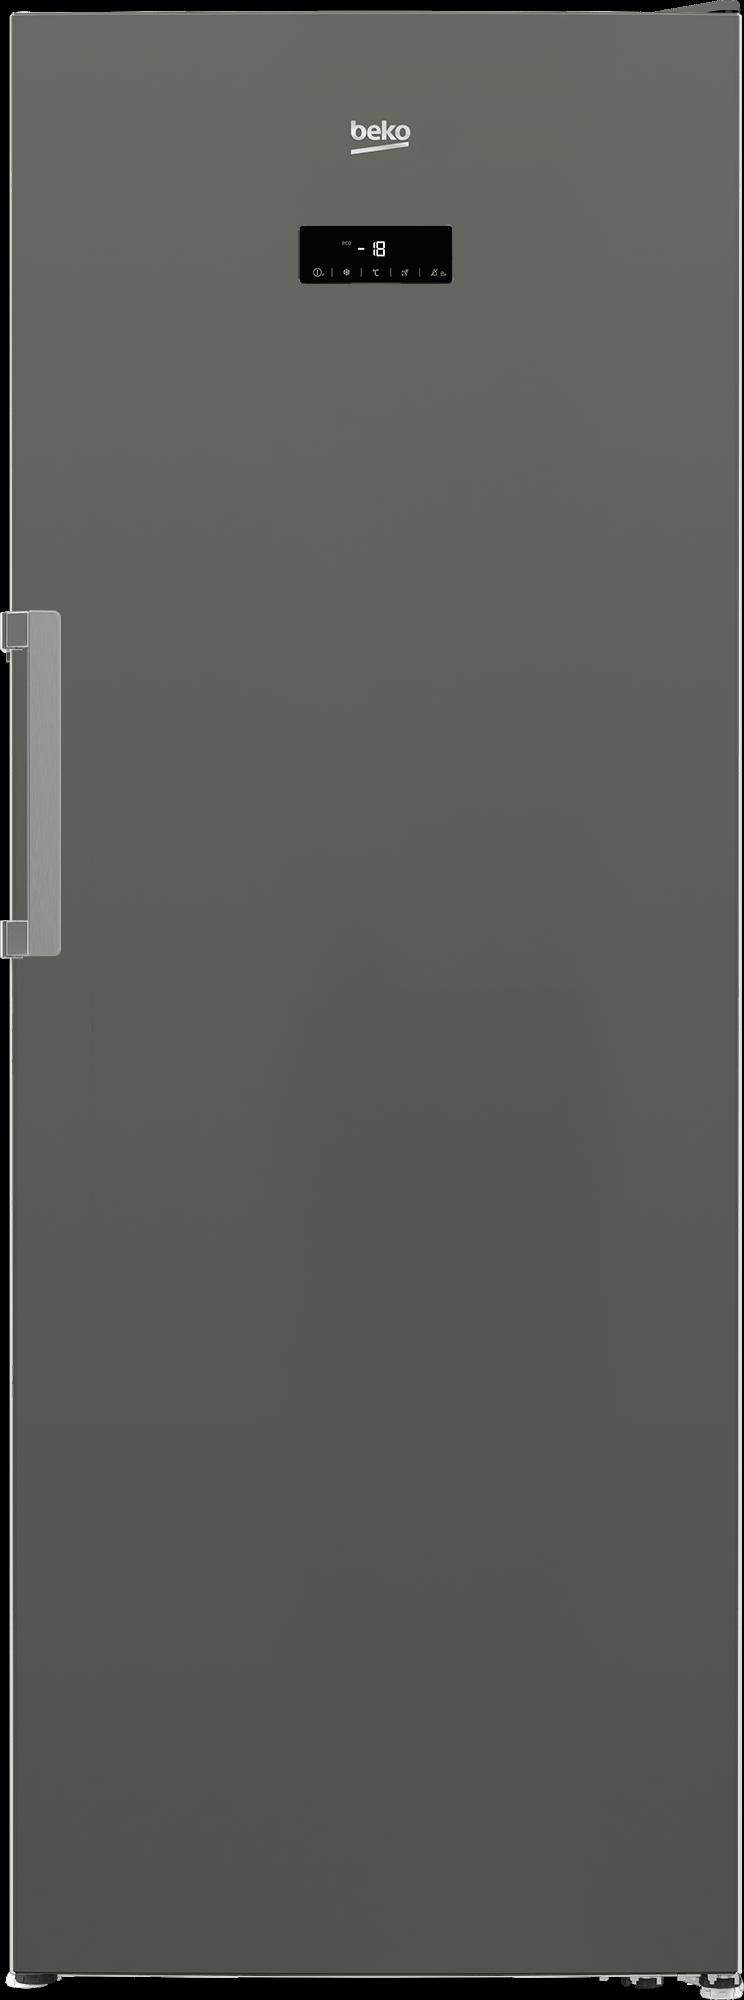 "Beko28"" Manhattan Grey Upright Freezer"